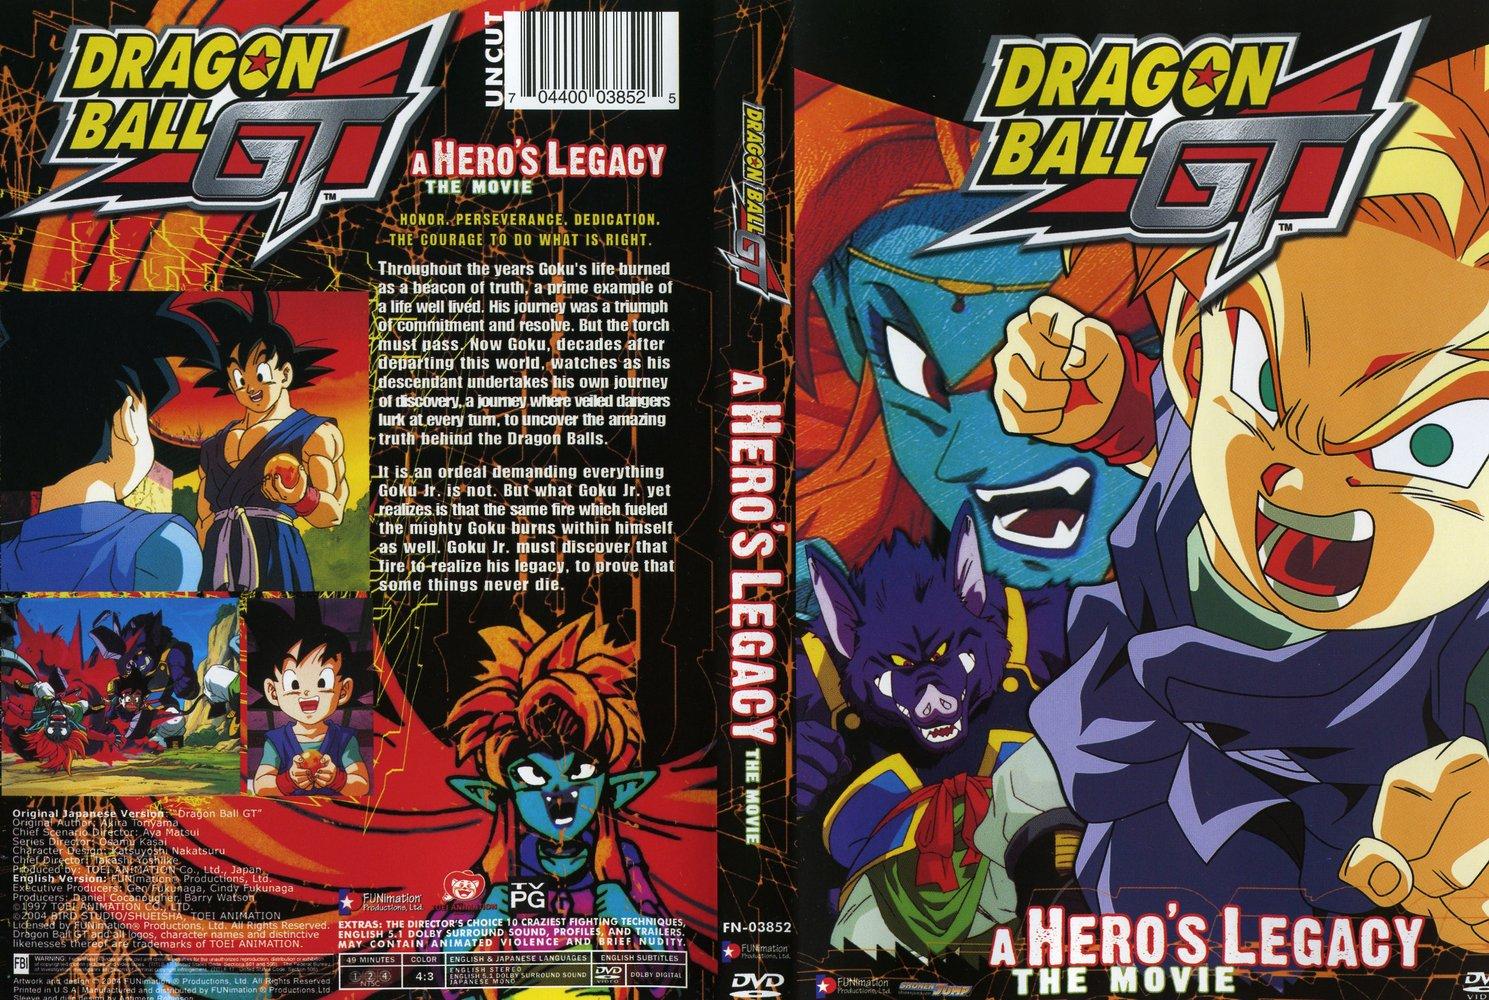 dragon ball z, dragonball, dragon ball art